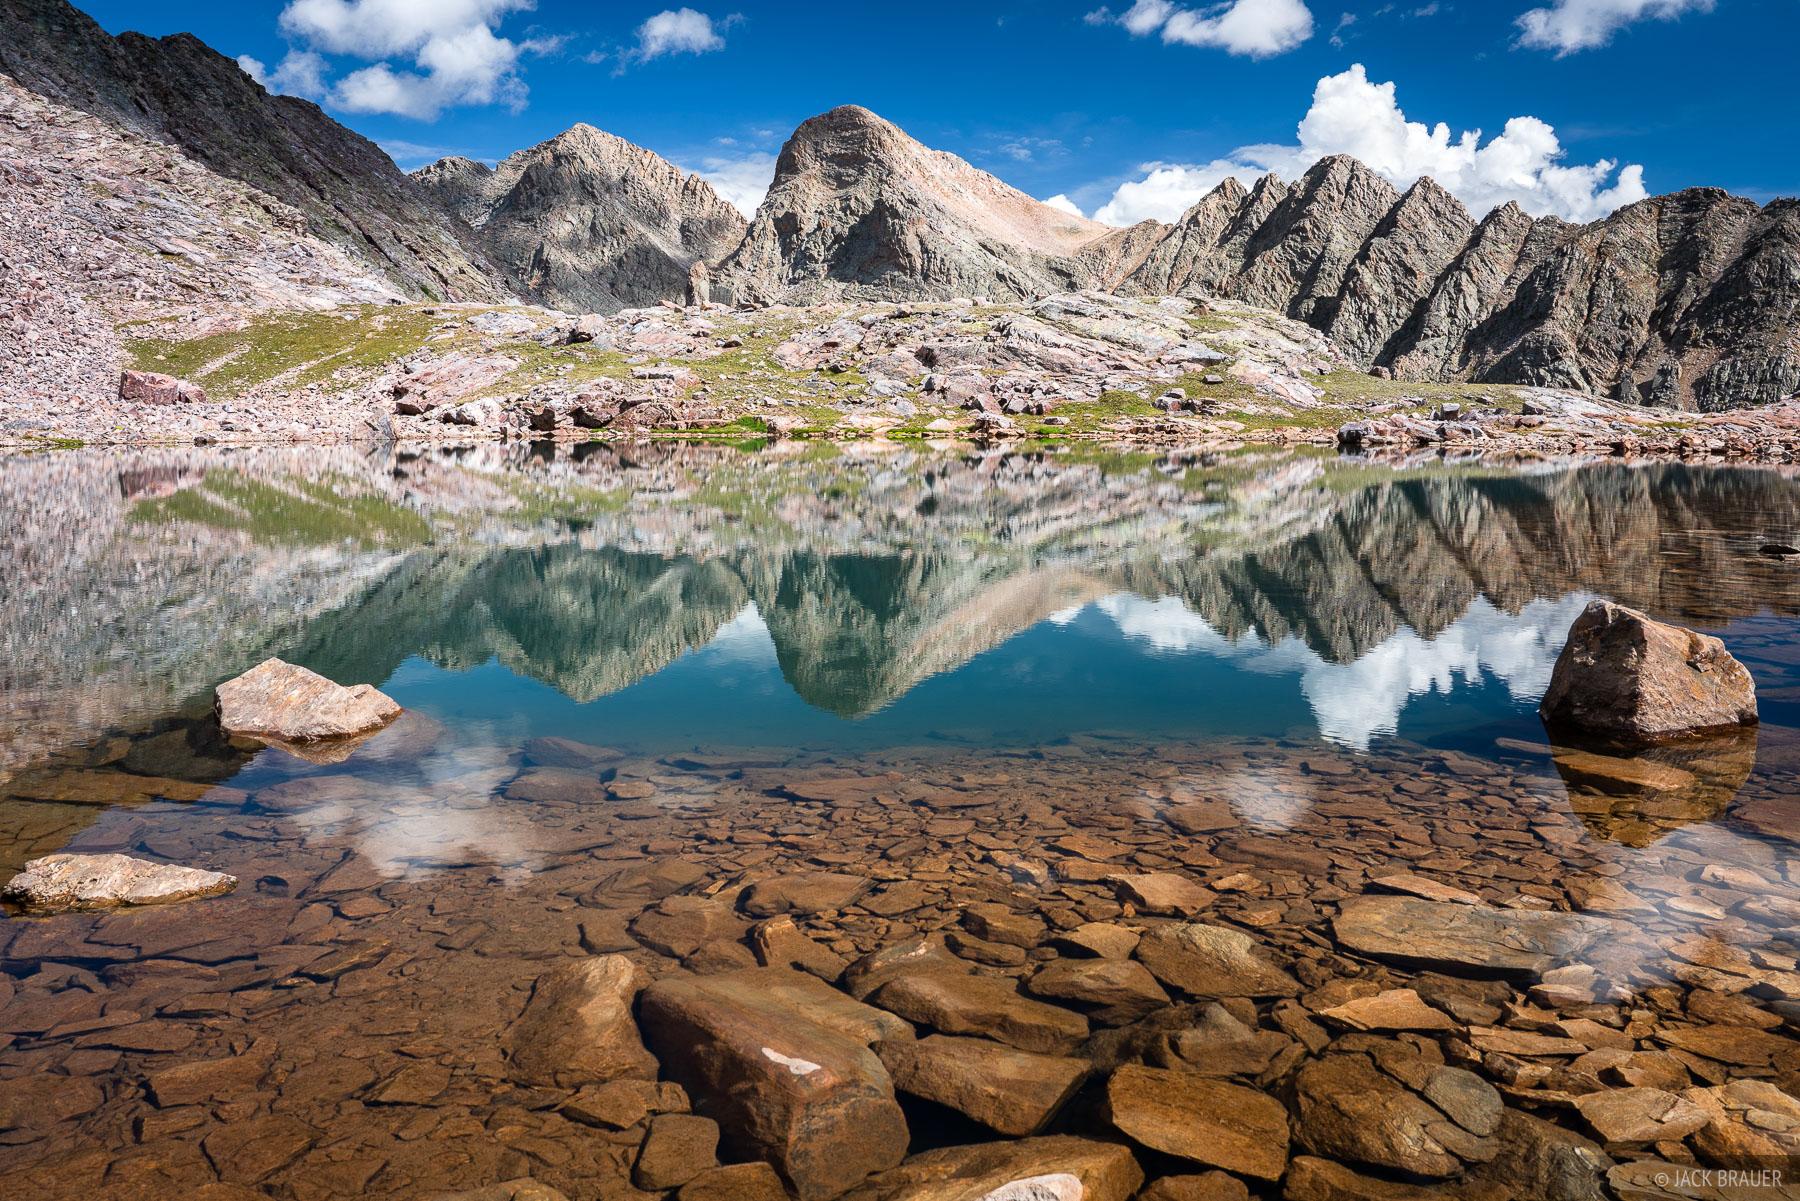 Colorado, Grenadier Range, San Juan Mountains, Trinity Peaks, Weminuche Wilderness, reflection, photo